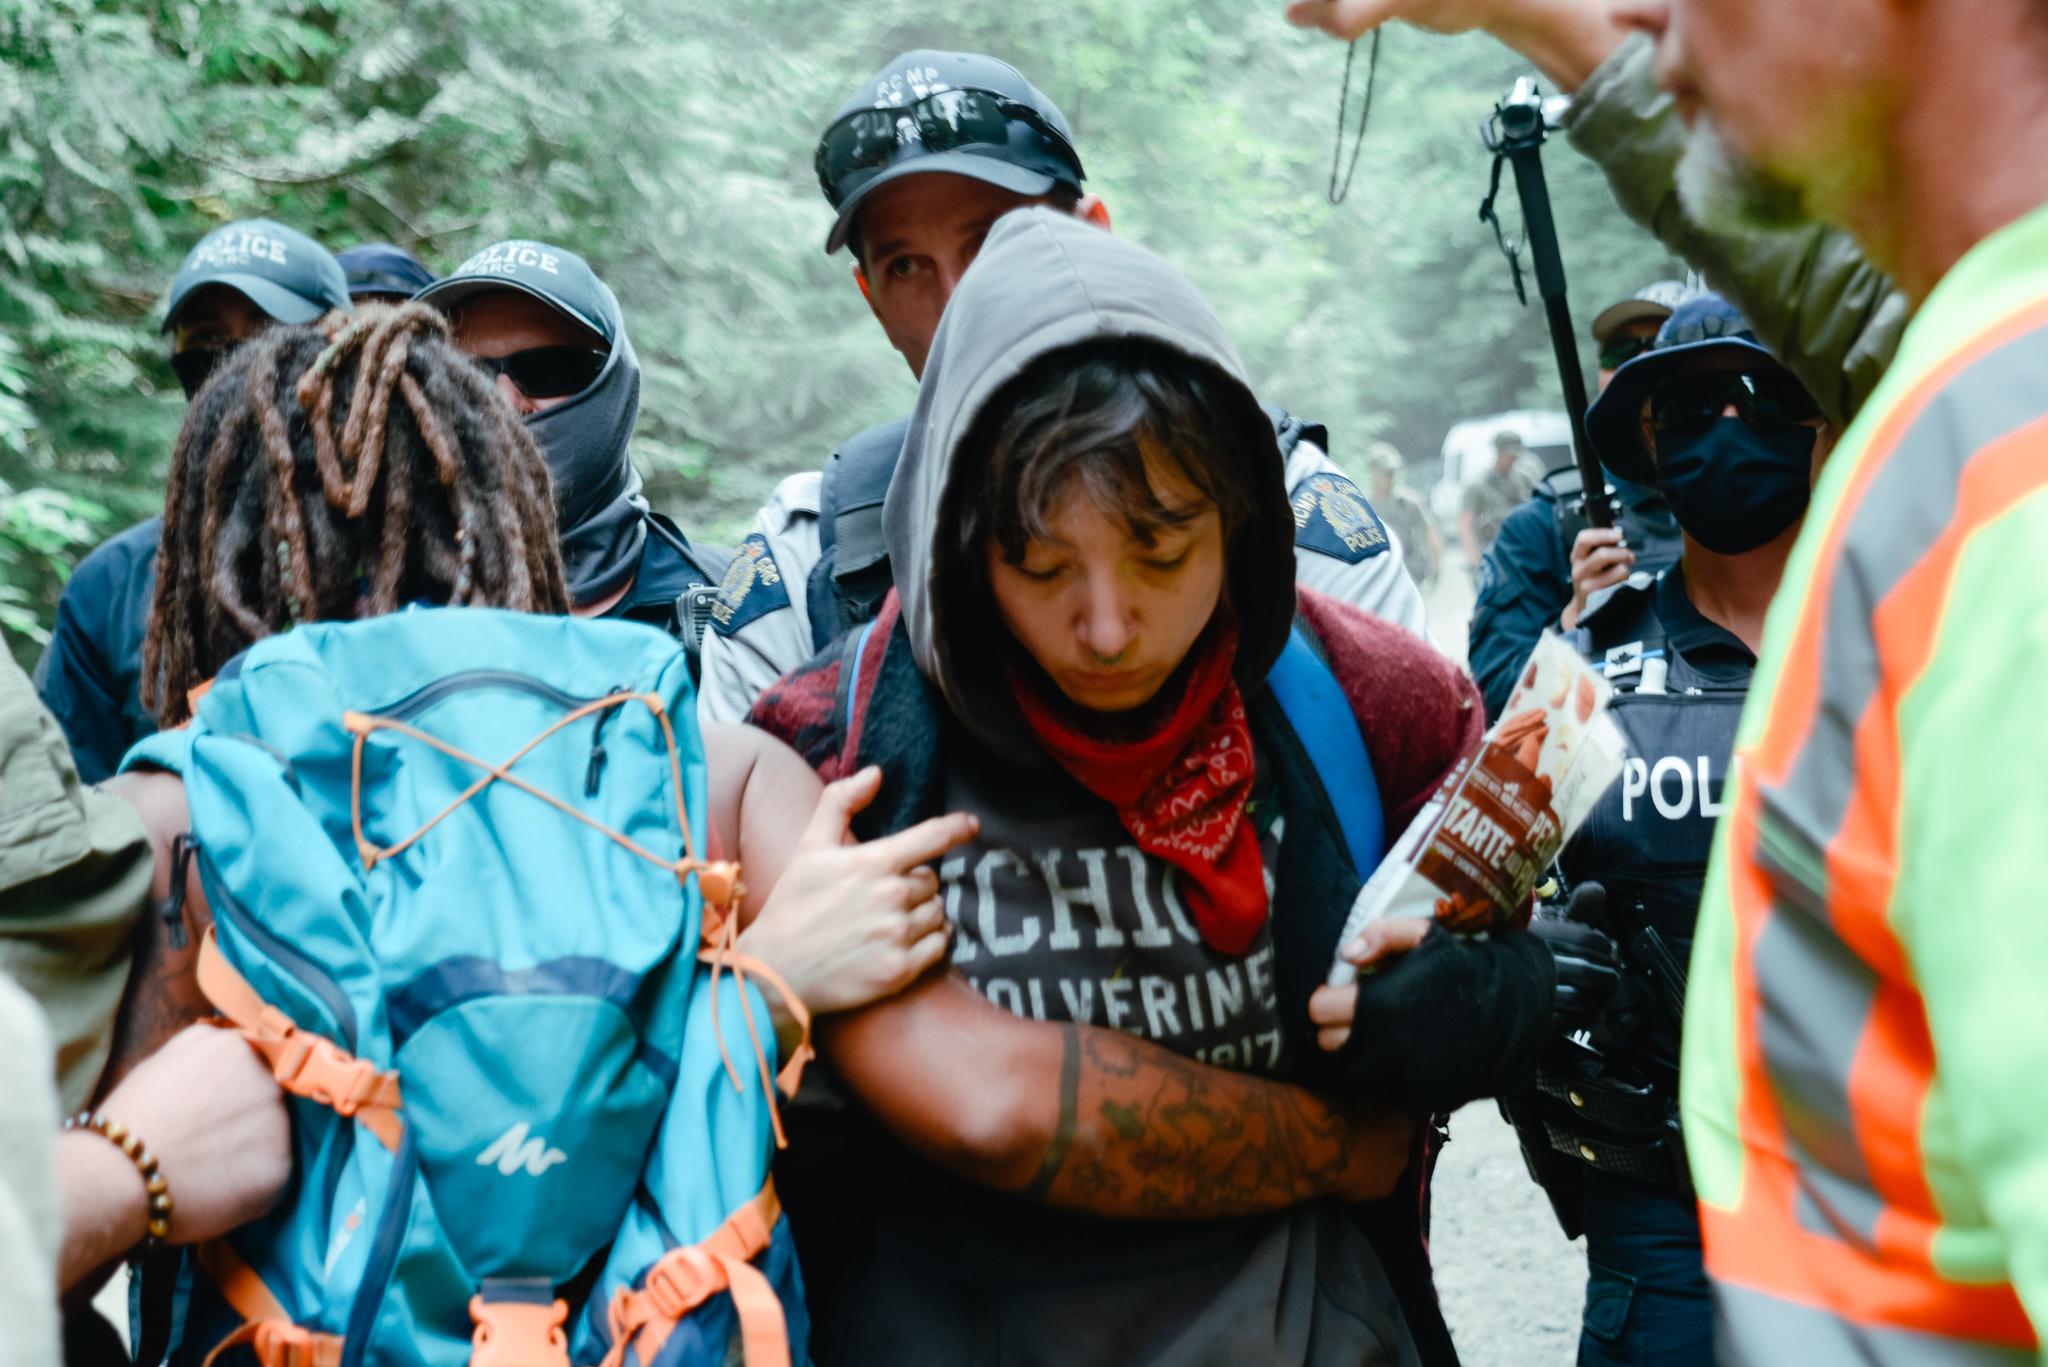 RCMP surrounding a protestor at Fairy Creek blockades